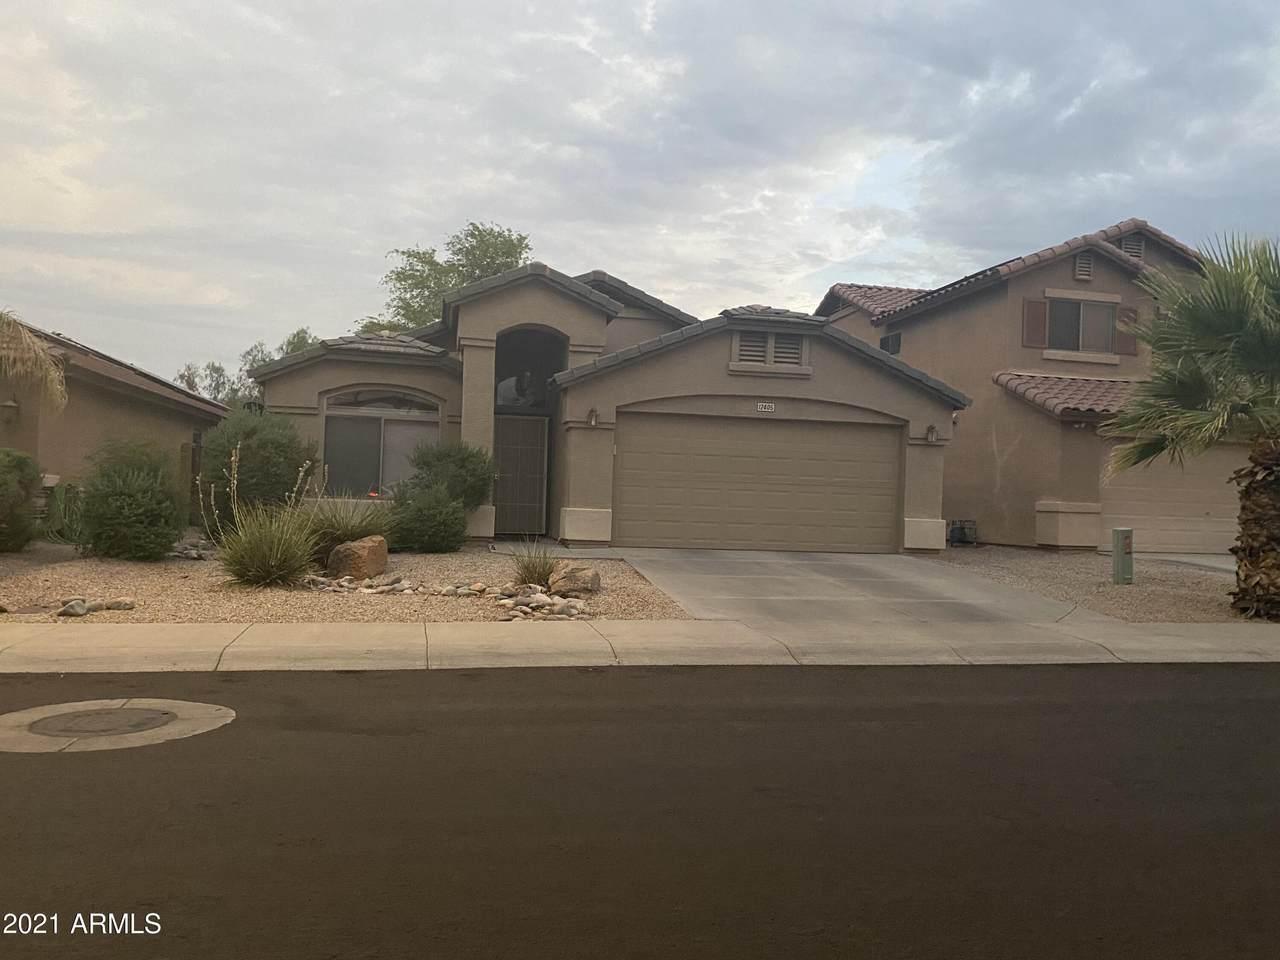 12405 Palo Verde Drive - Photo 1